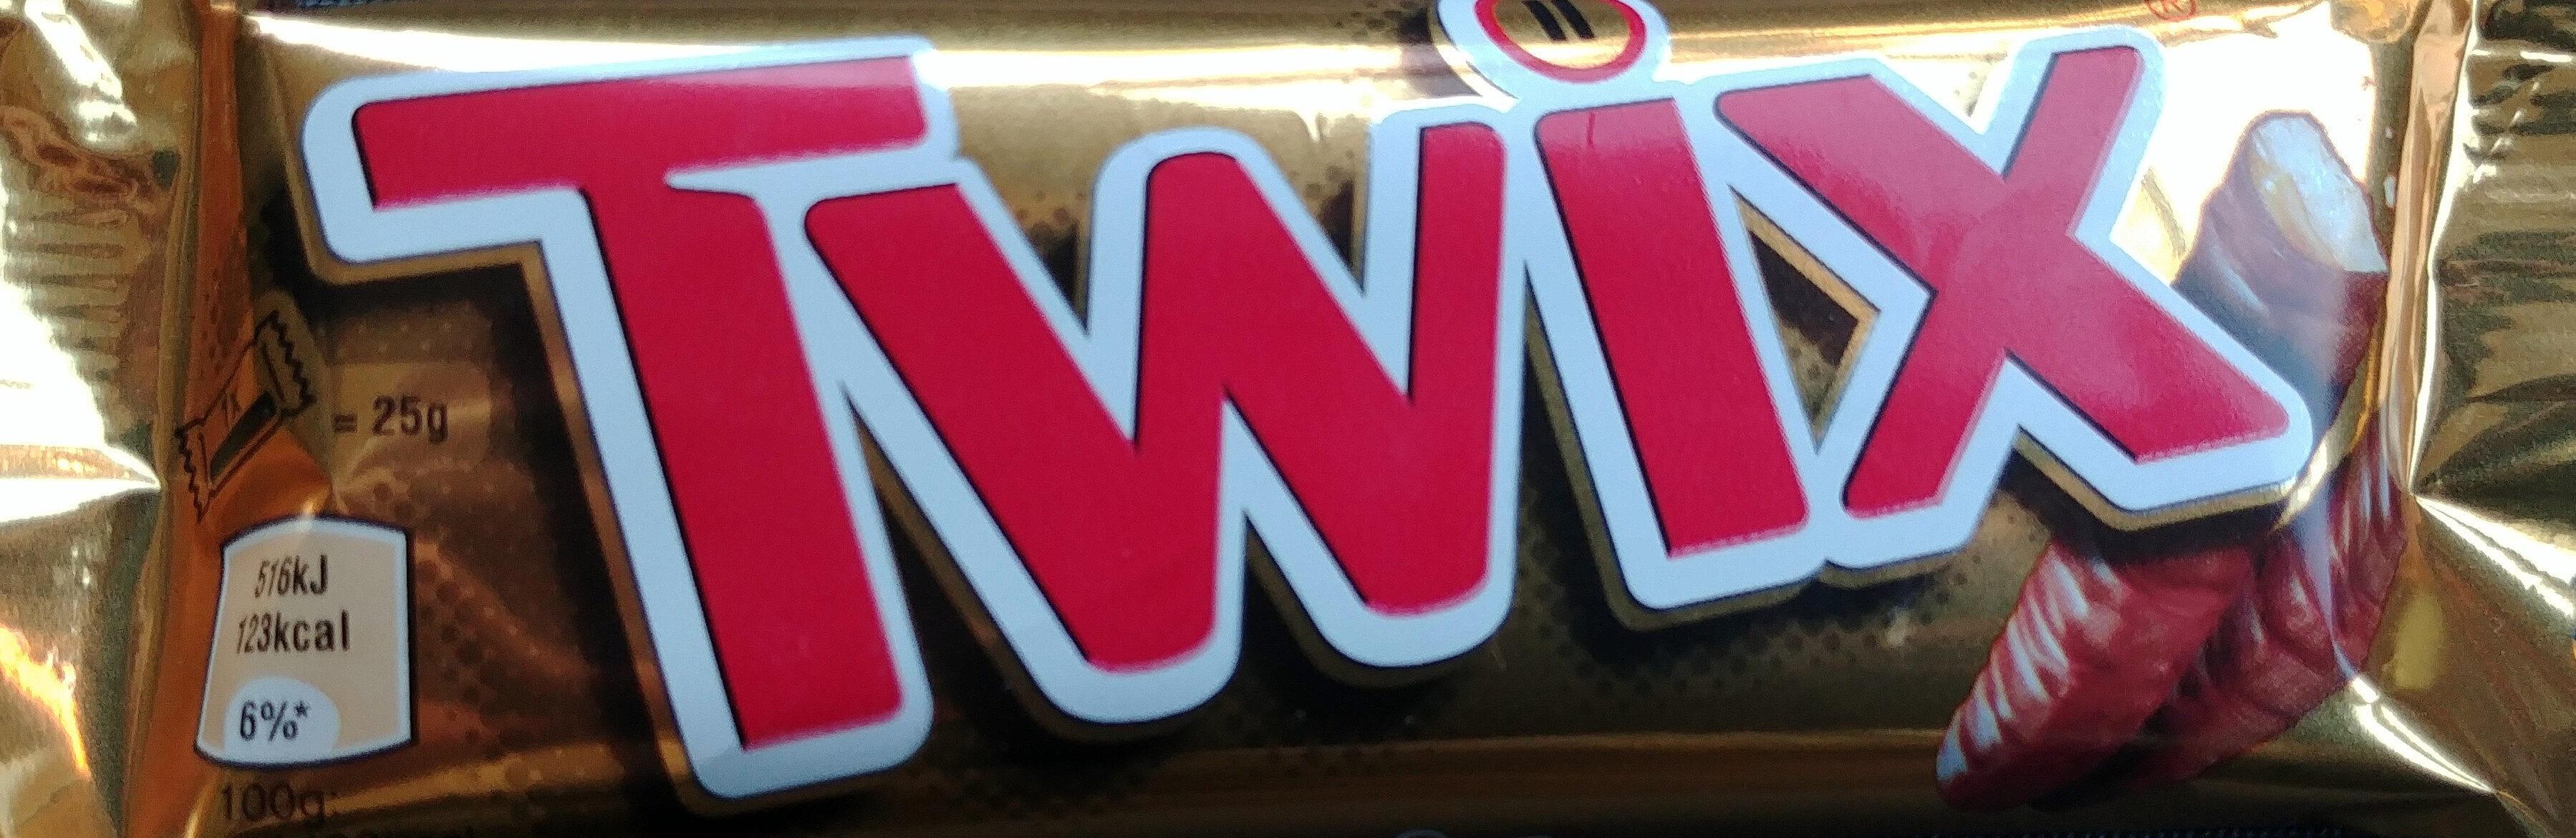 Twix - Producto - es